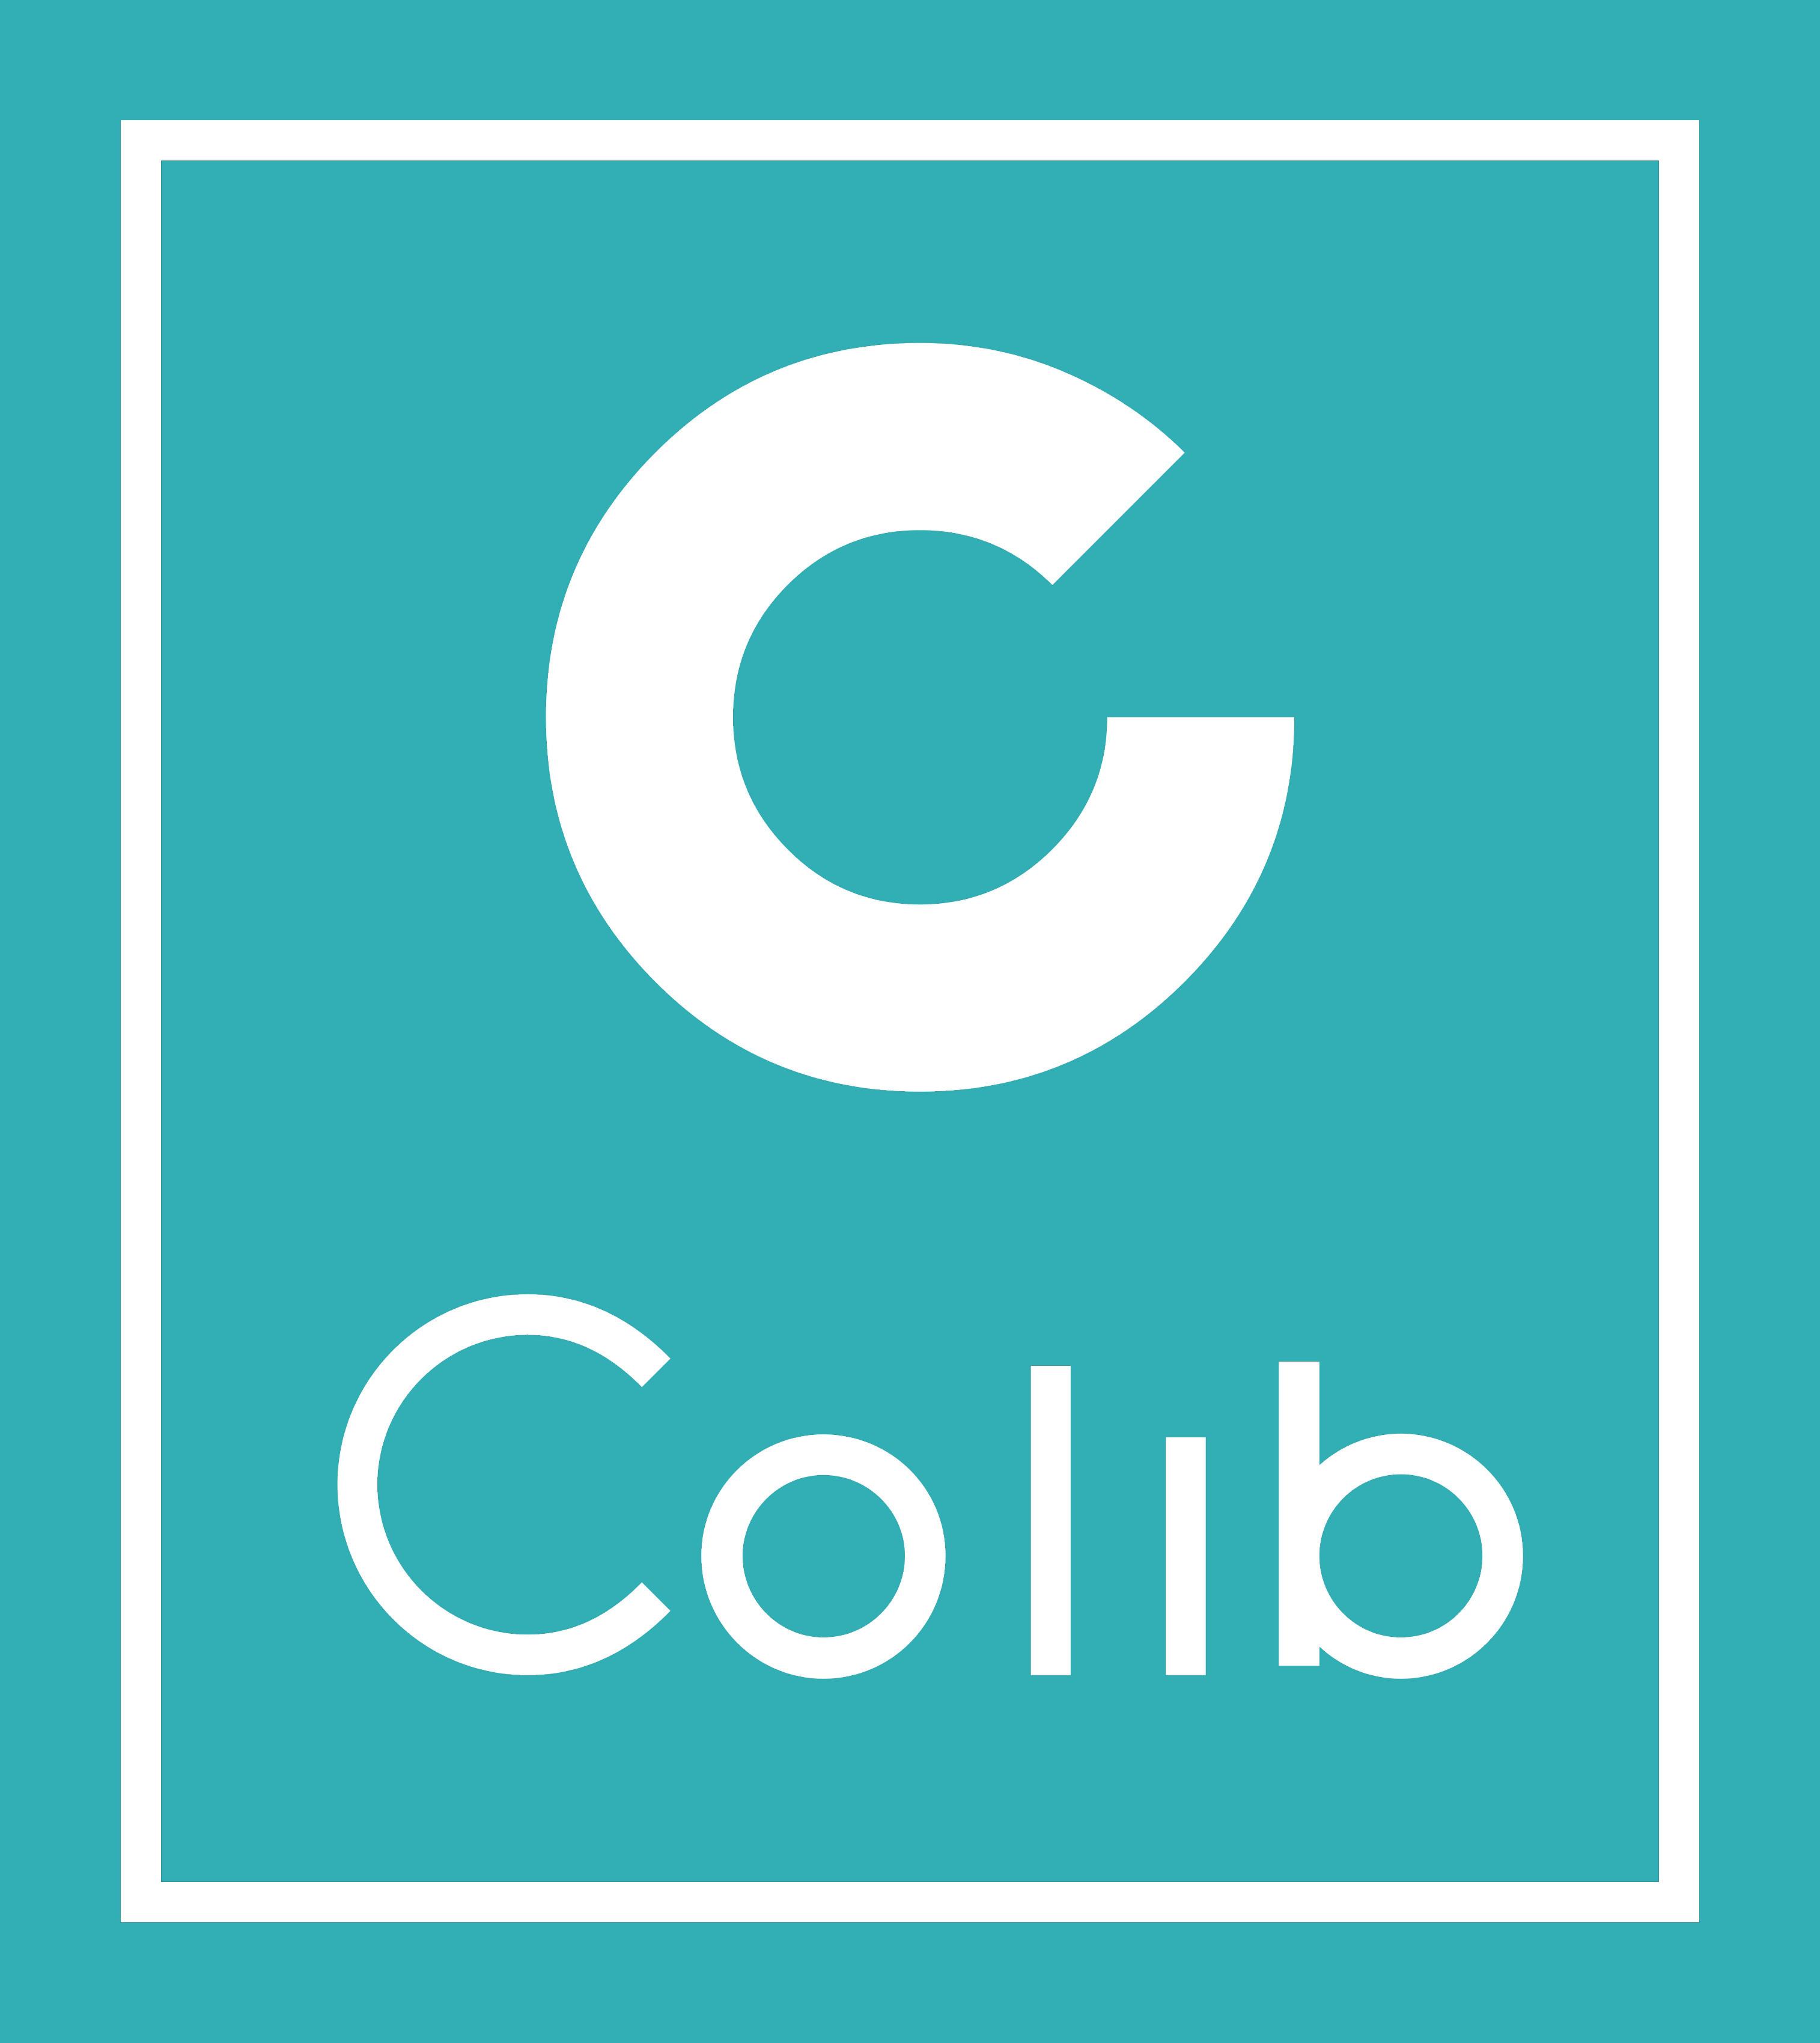 Colib logo